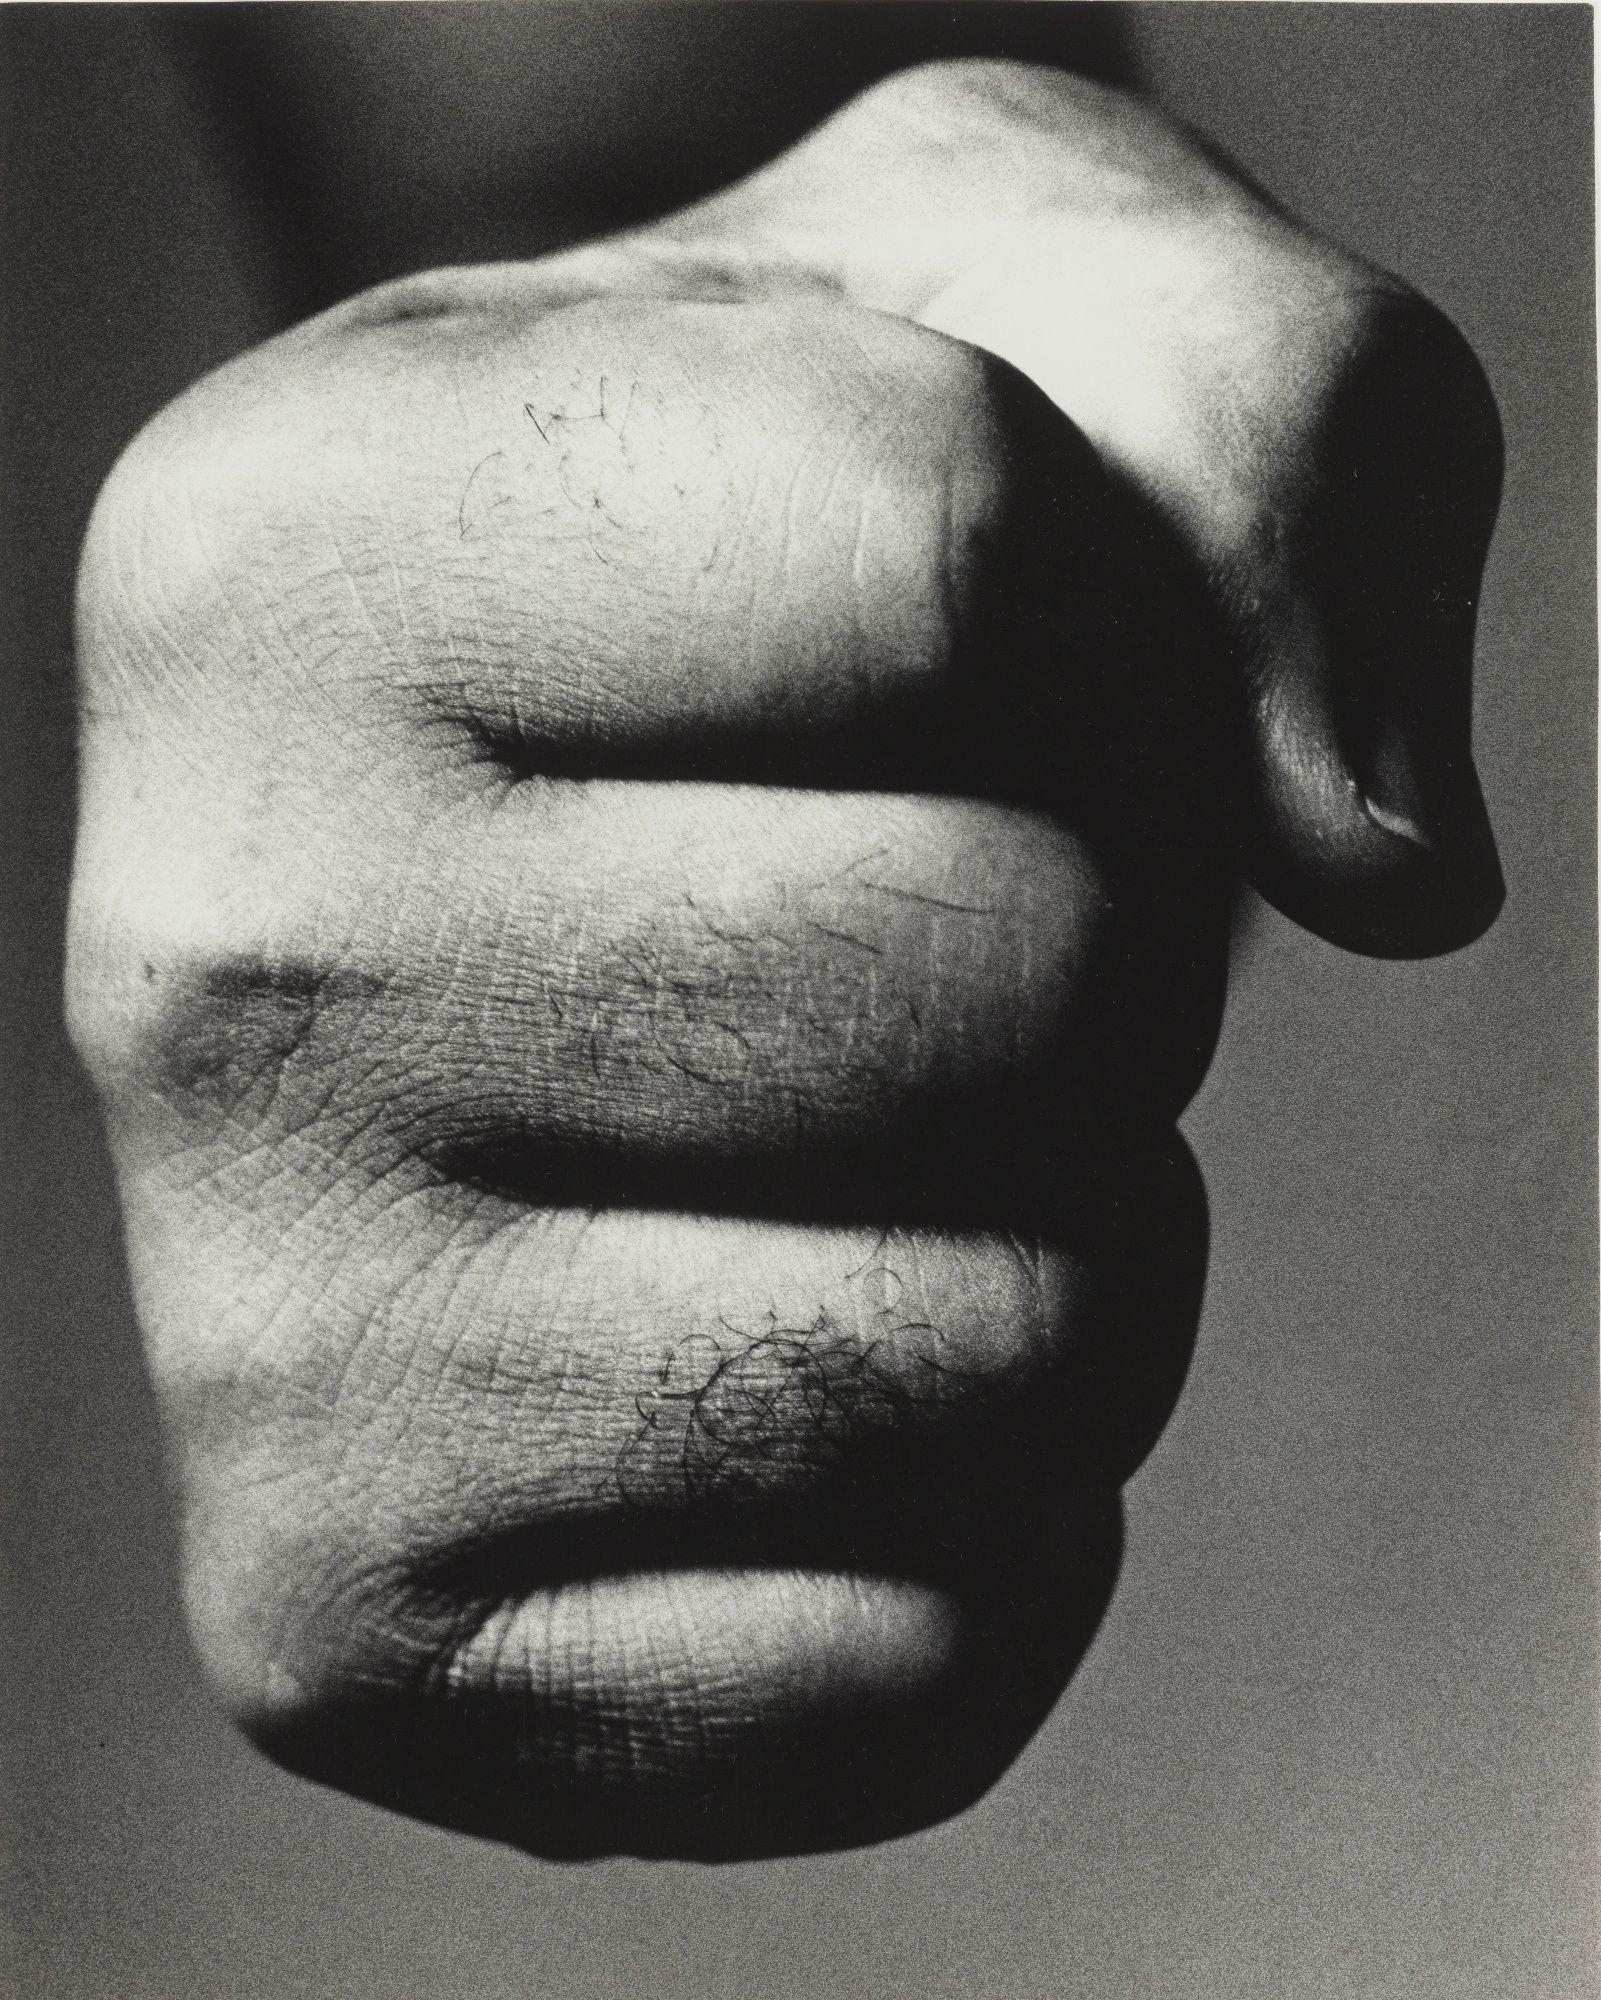 The Hands Of A Fighter I Love Men's Hands  Bad Boys Bad Boys   Pinterest